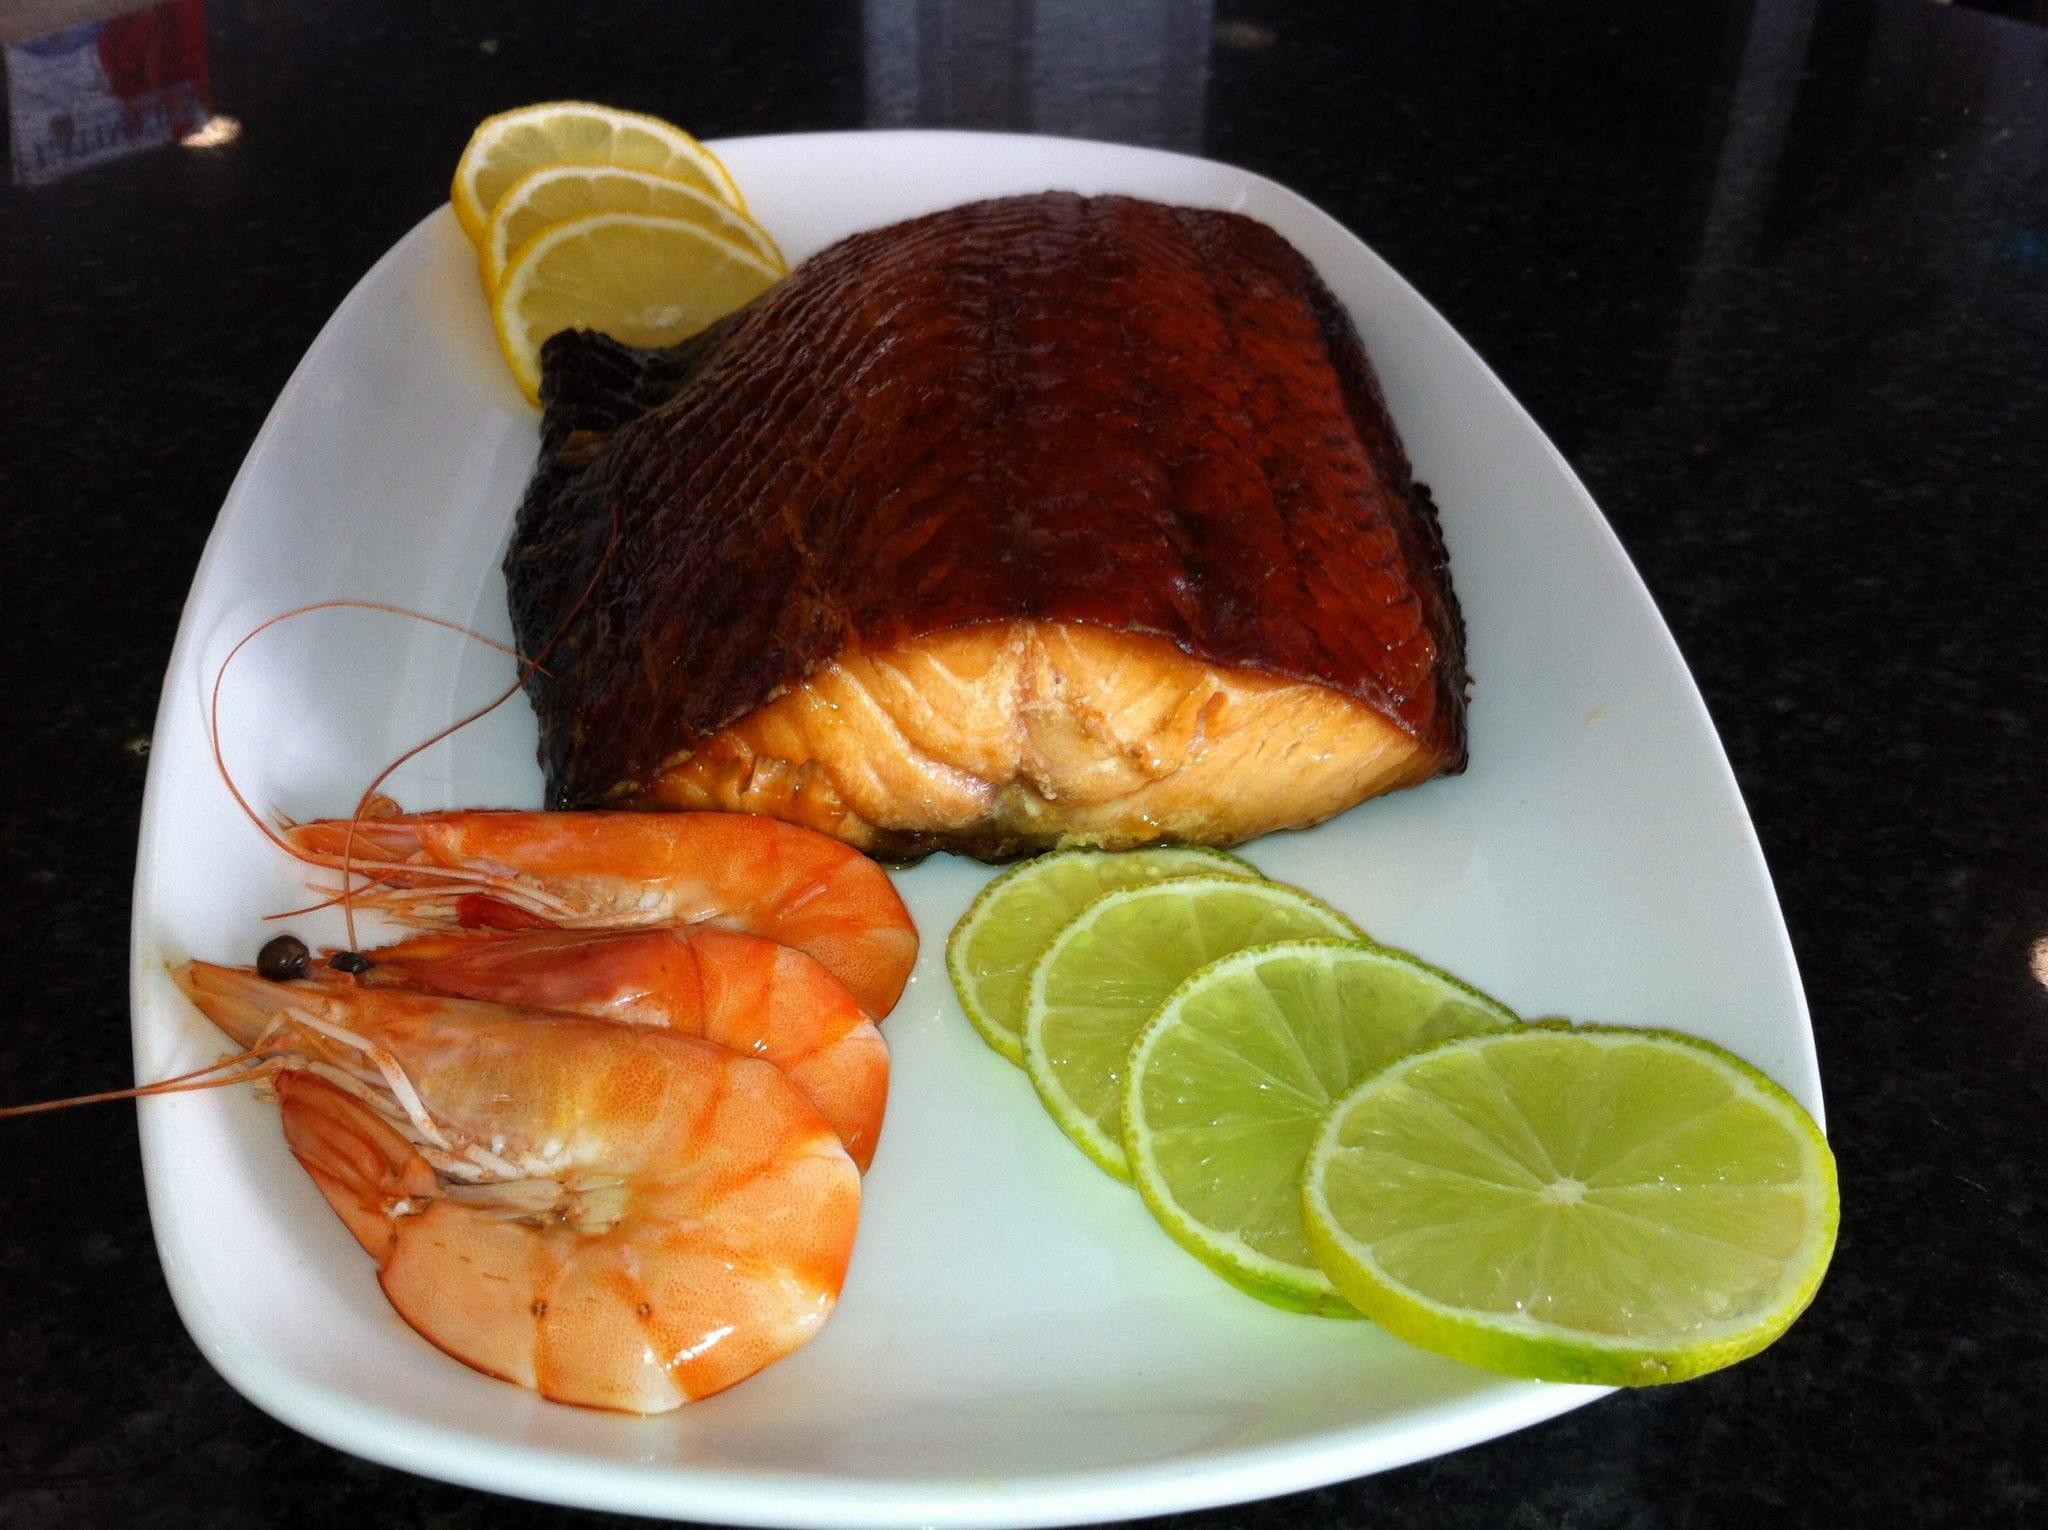 Roast Smoked Salmon Latimers Seafood Deli Cafe